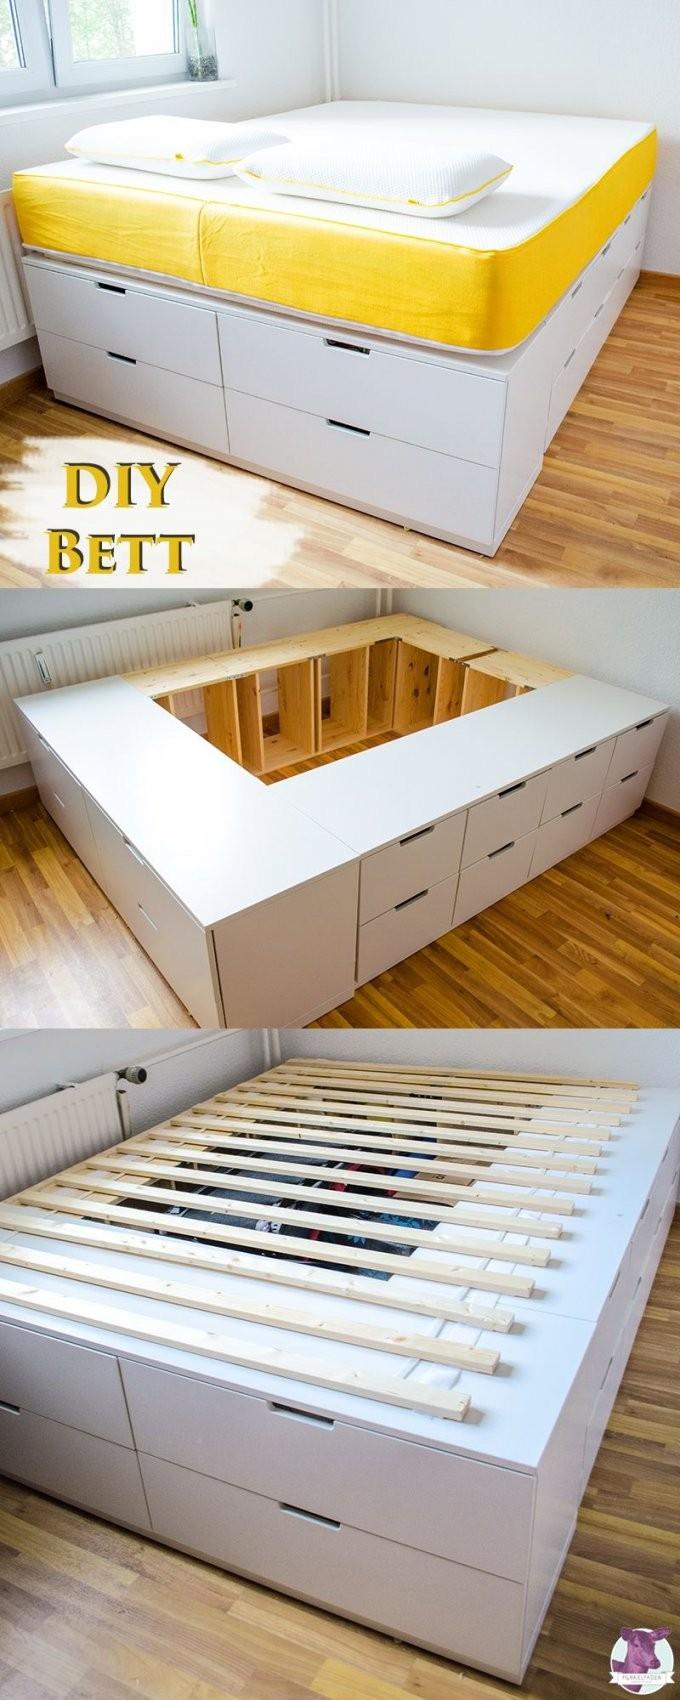 Diy Ikea Hack  Plattformbett Selber Bauen Aus Ikea Kommoden von Bett Selber Bauen Anleitung 140X200 Photo